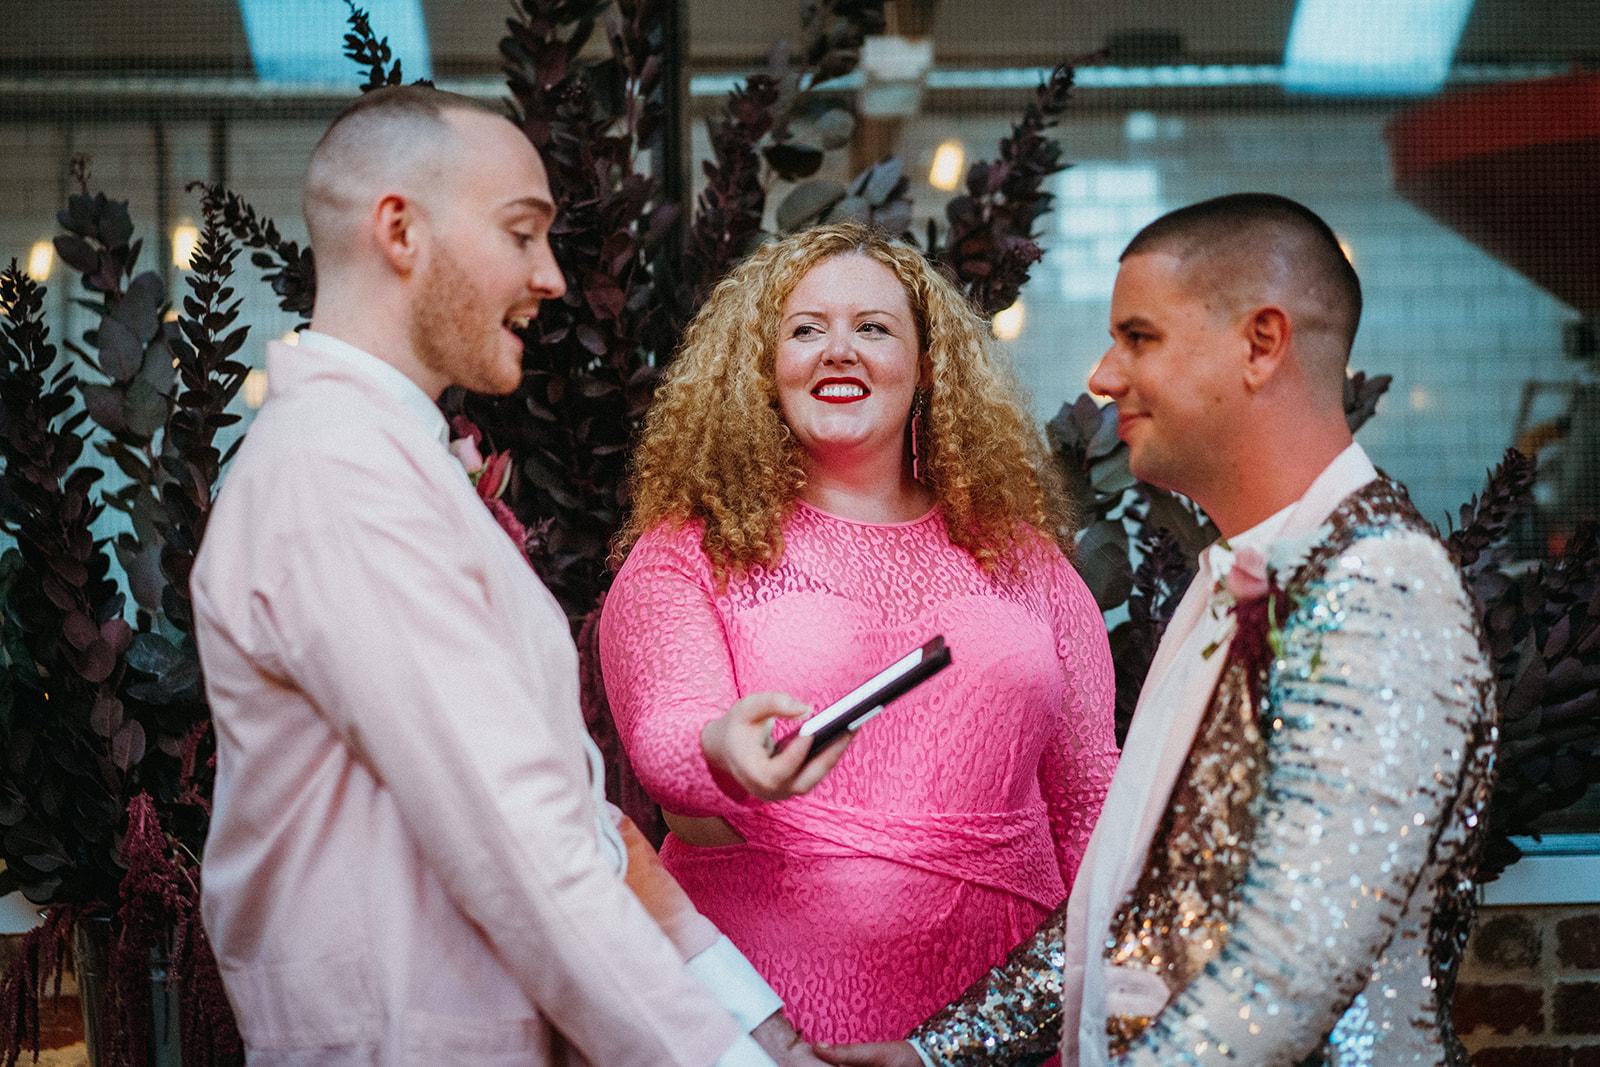 Casey_Harrison-Melbourne Wedding-0286-ONE05966.jpg